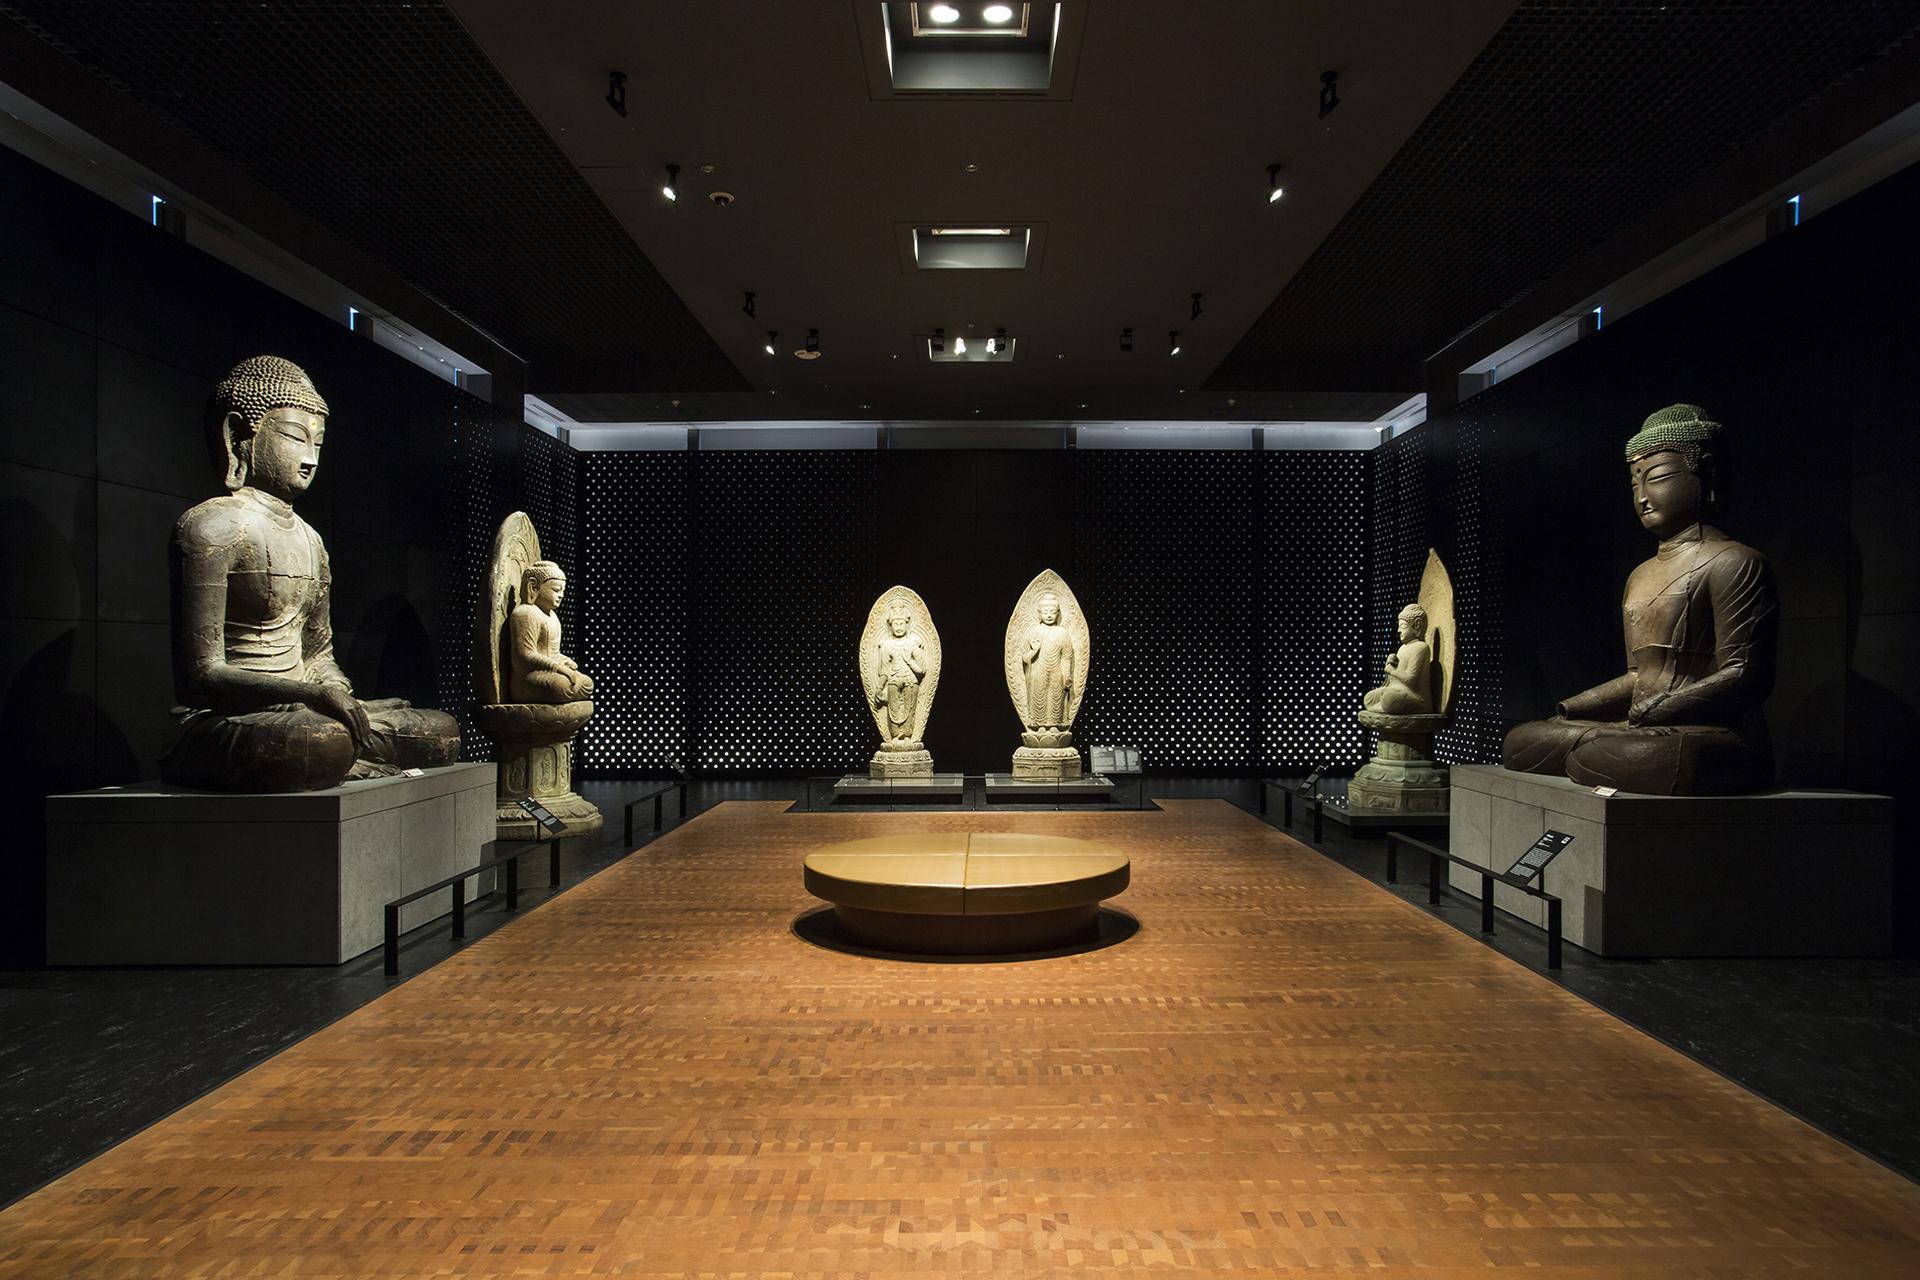 National Museum of Korea Buddha Gallery